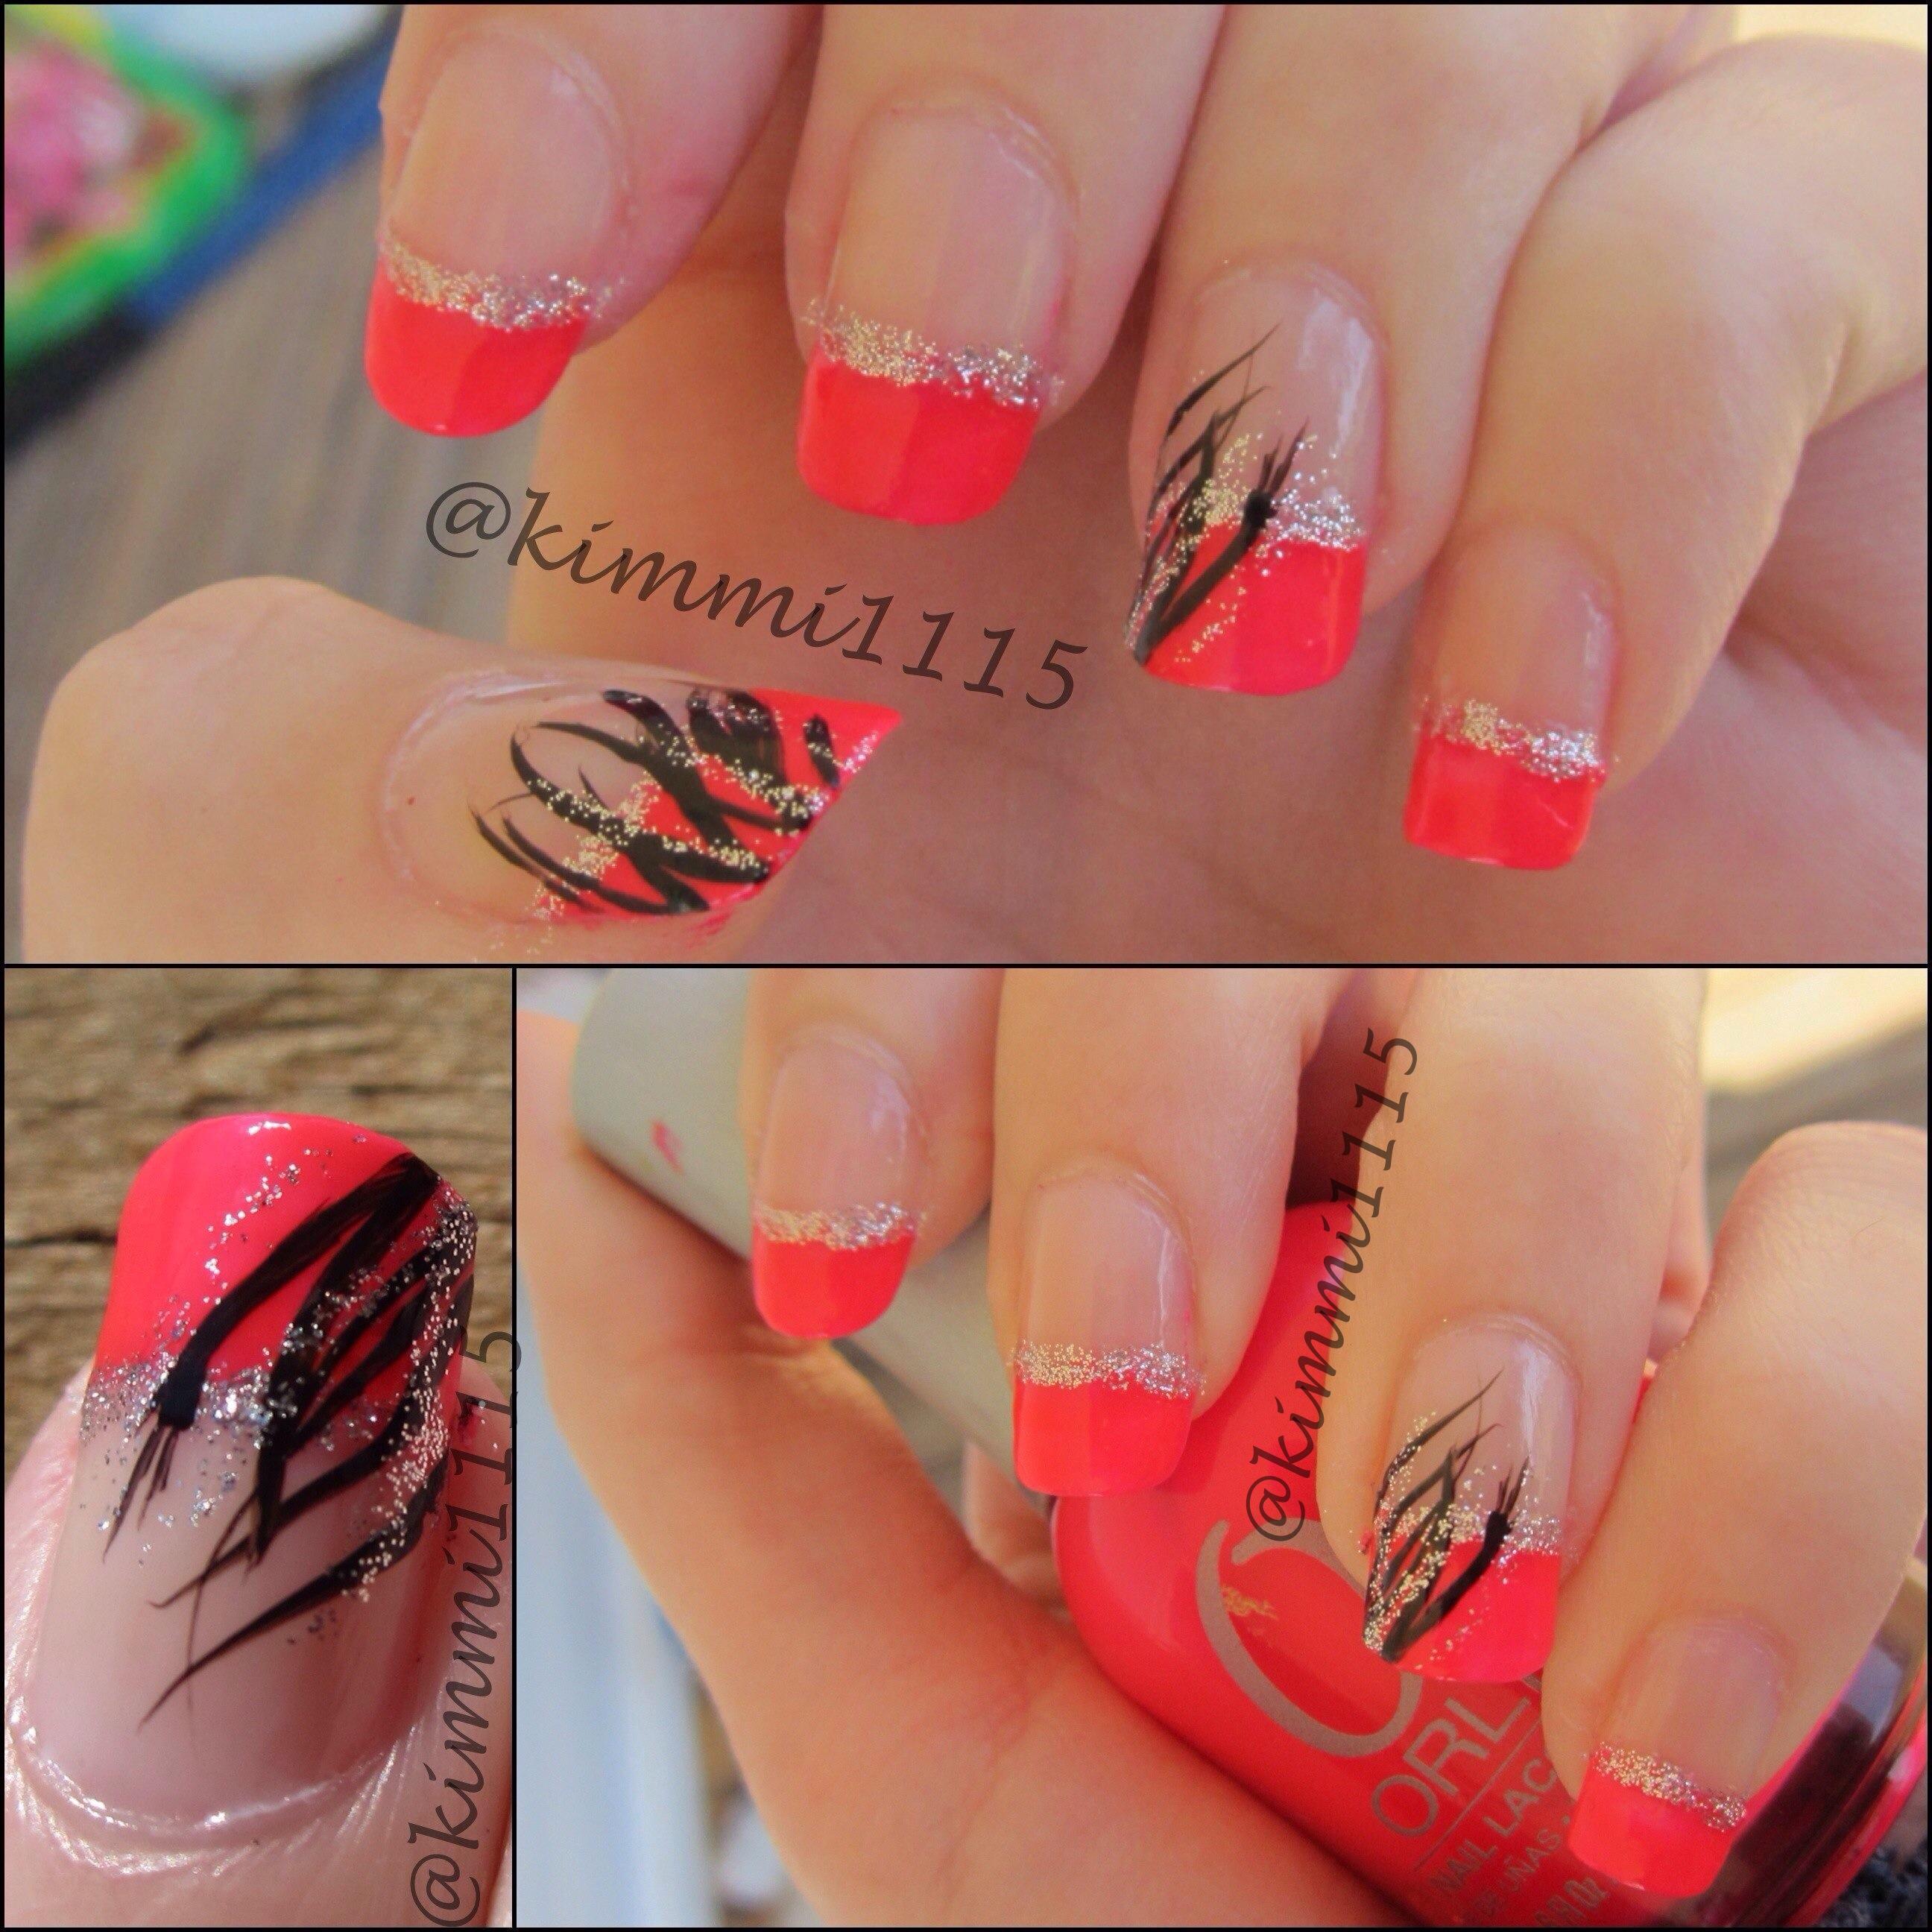 21st birthday nails - beauty insider